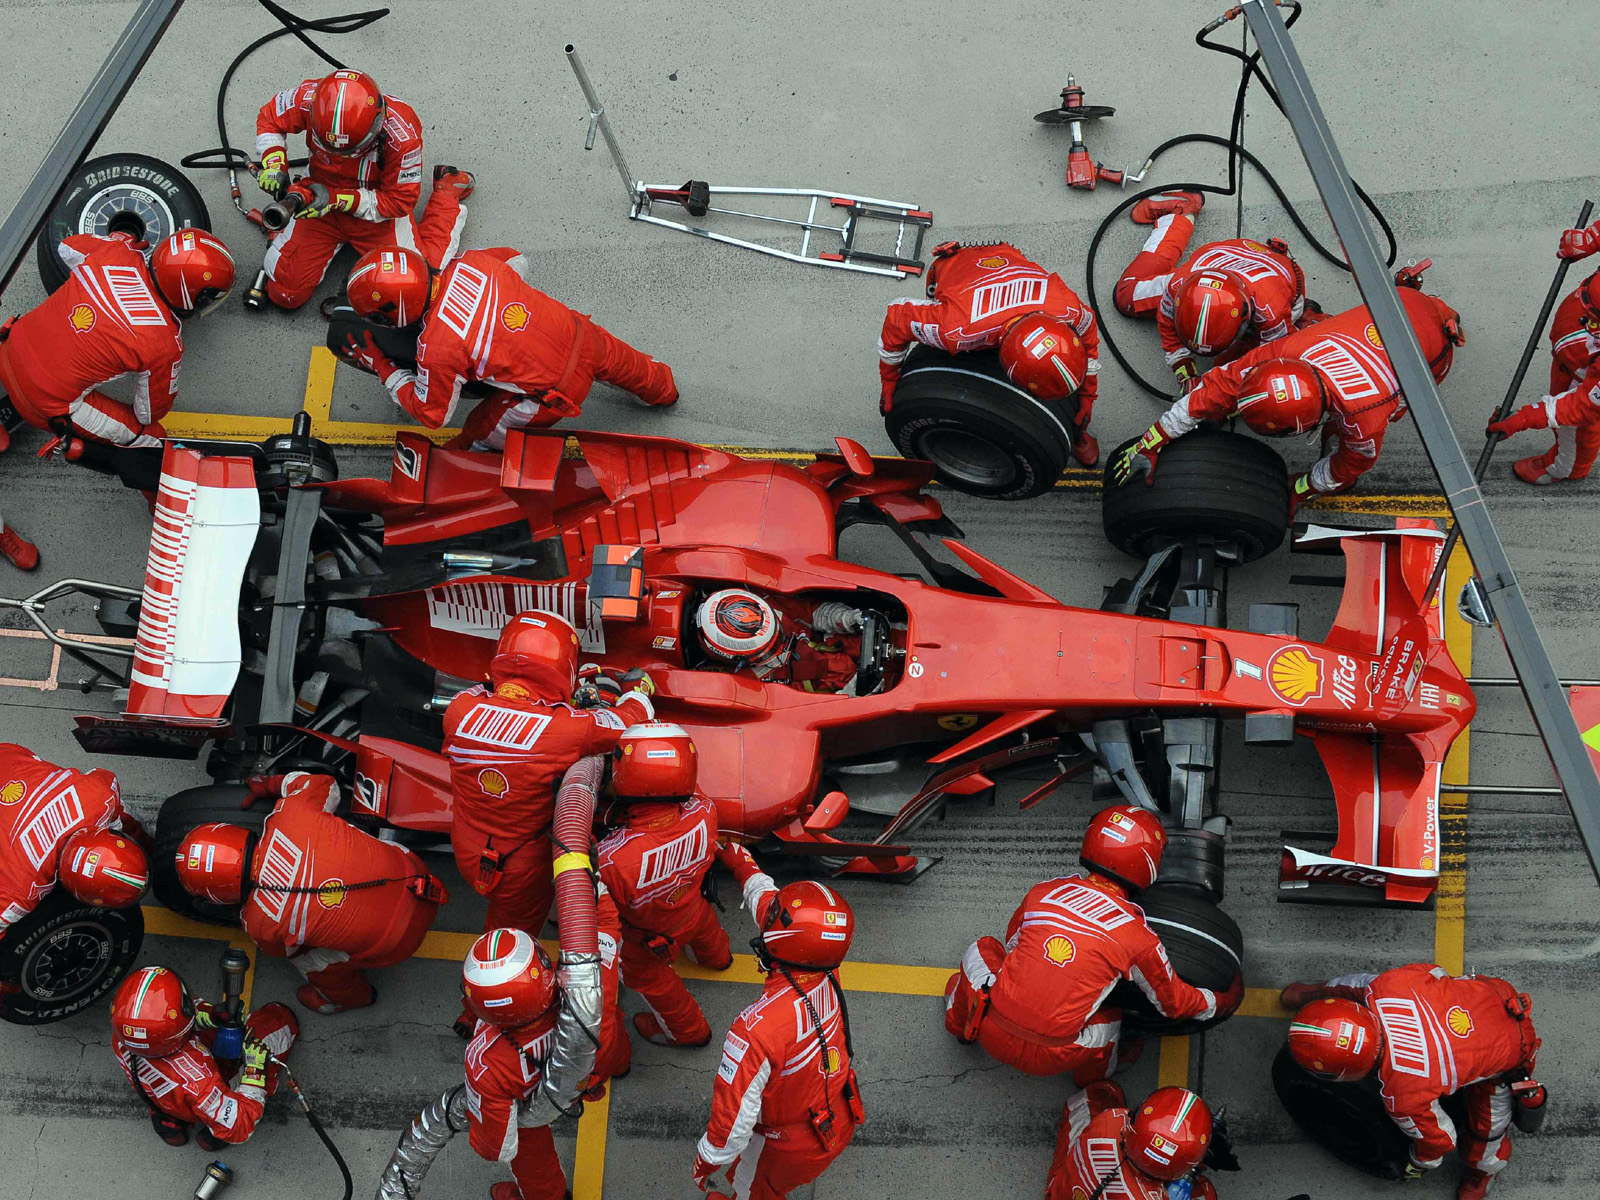 HD Formula 1 Wallpapers 1600x1200